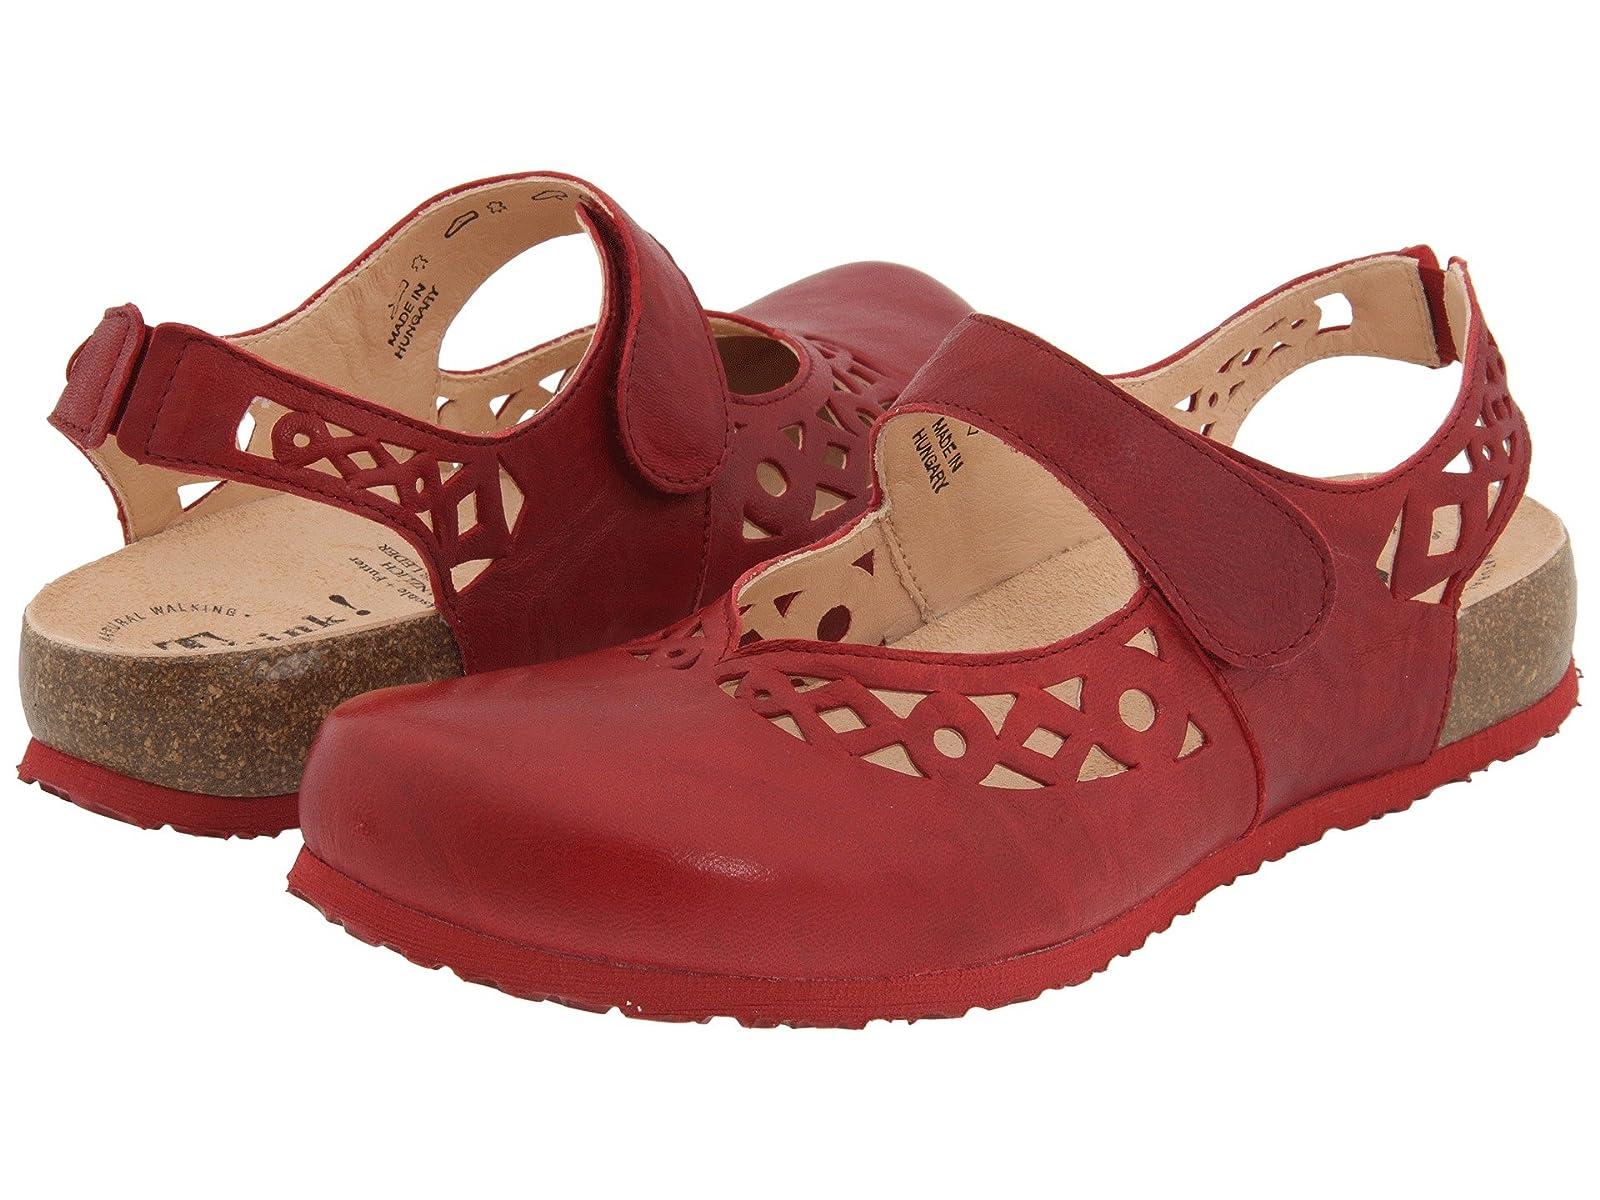 Think! Julia - 86341Atmospheric grades have affordable shoes